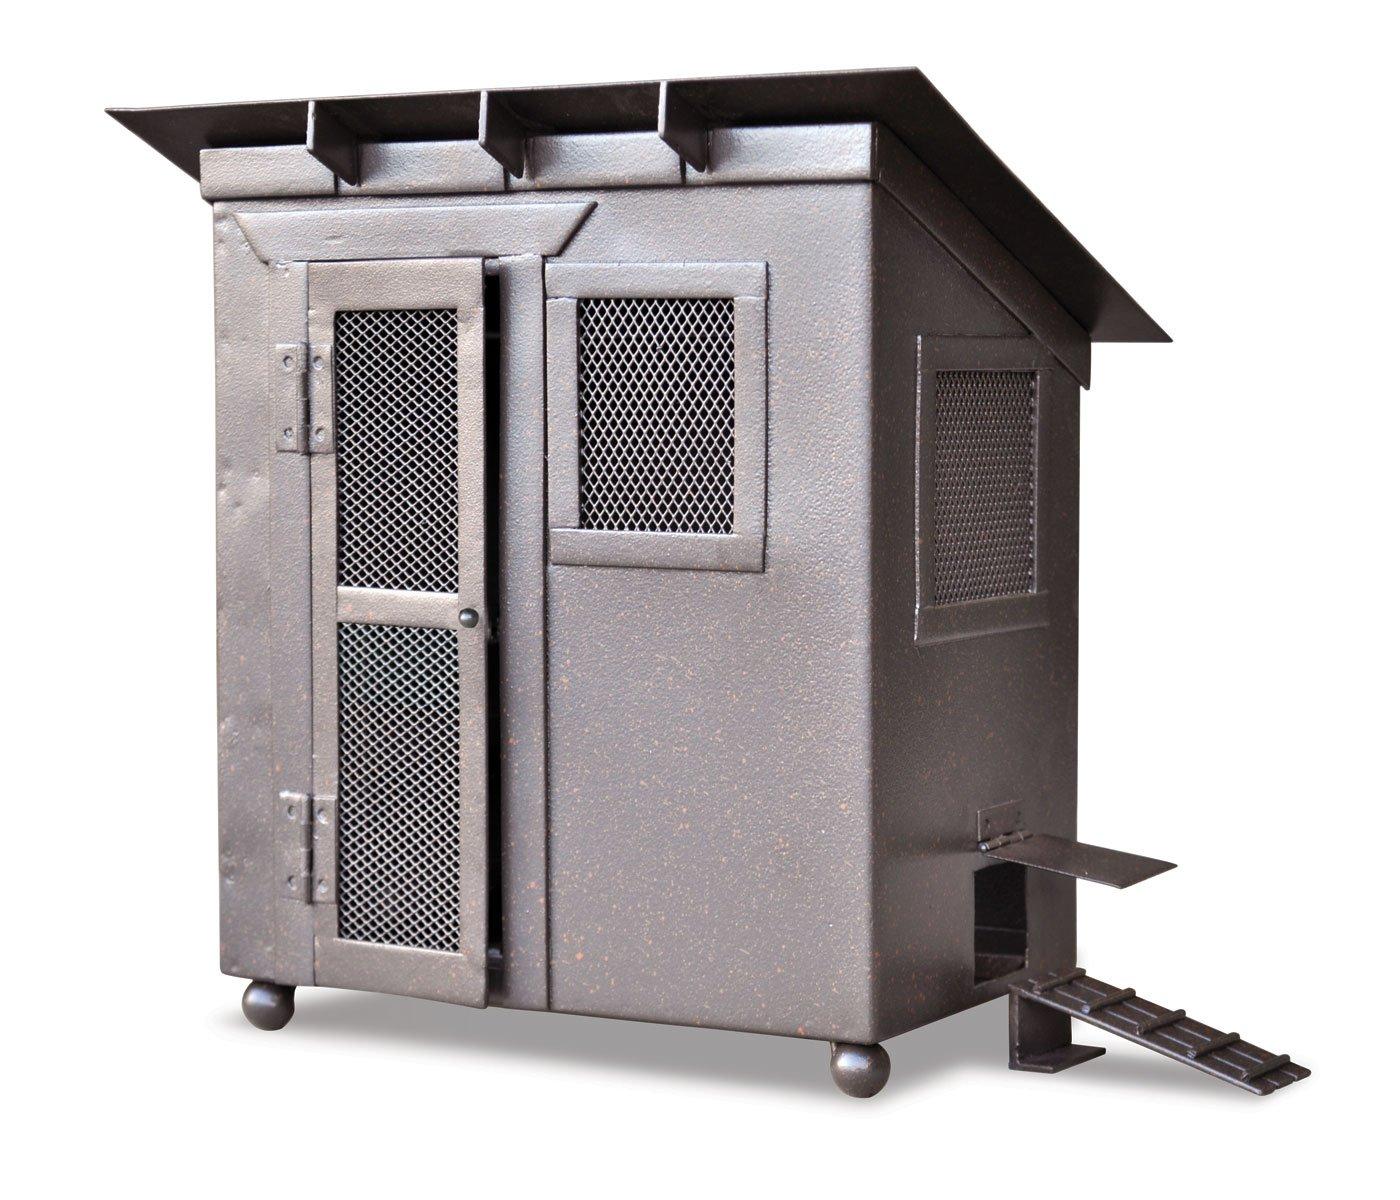 Awesome Amazon.com : Georgetown Home And Garden Chicken Coop, Mini : Garden Gifts  For Women : Garden U0026 Outdoor